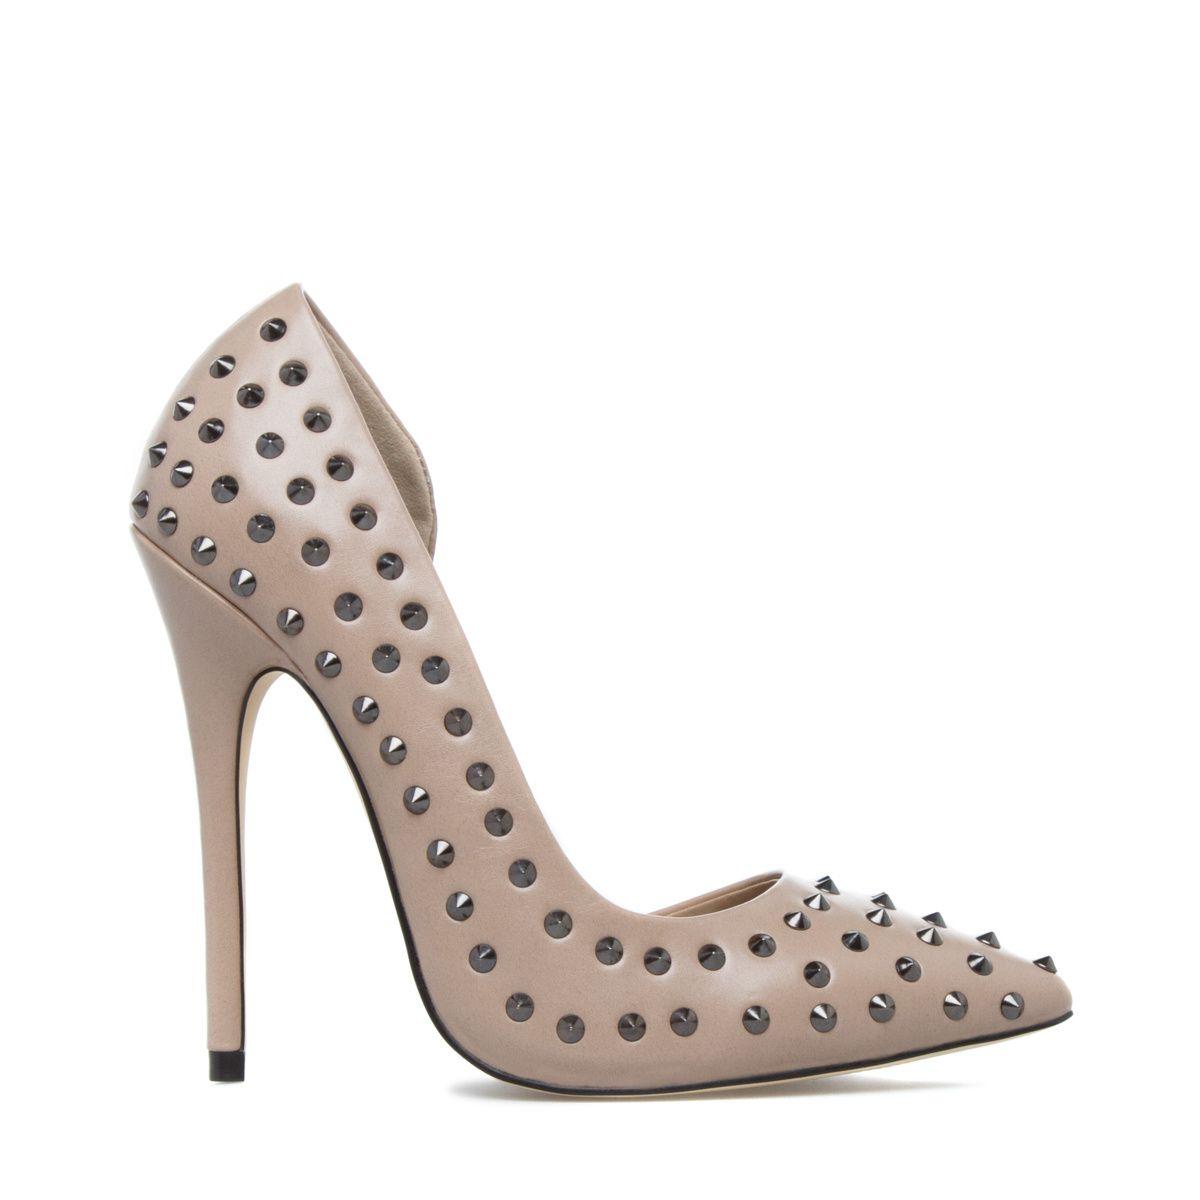 78e4e4005b9 Token ShoeDazzle Gorgeous sparkle love all Betsey